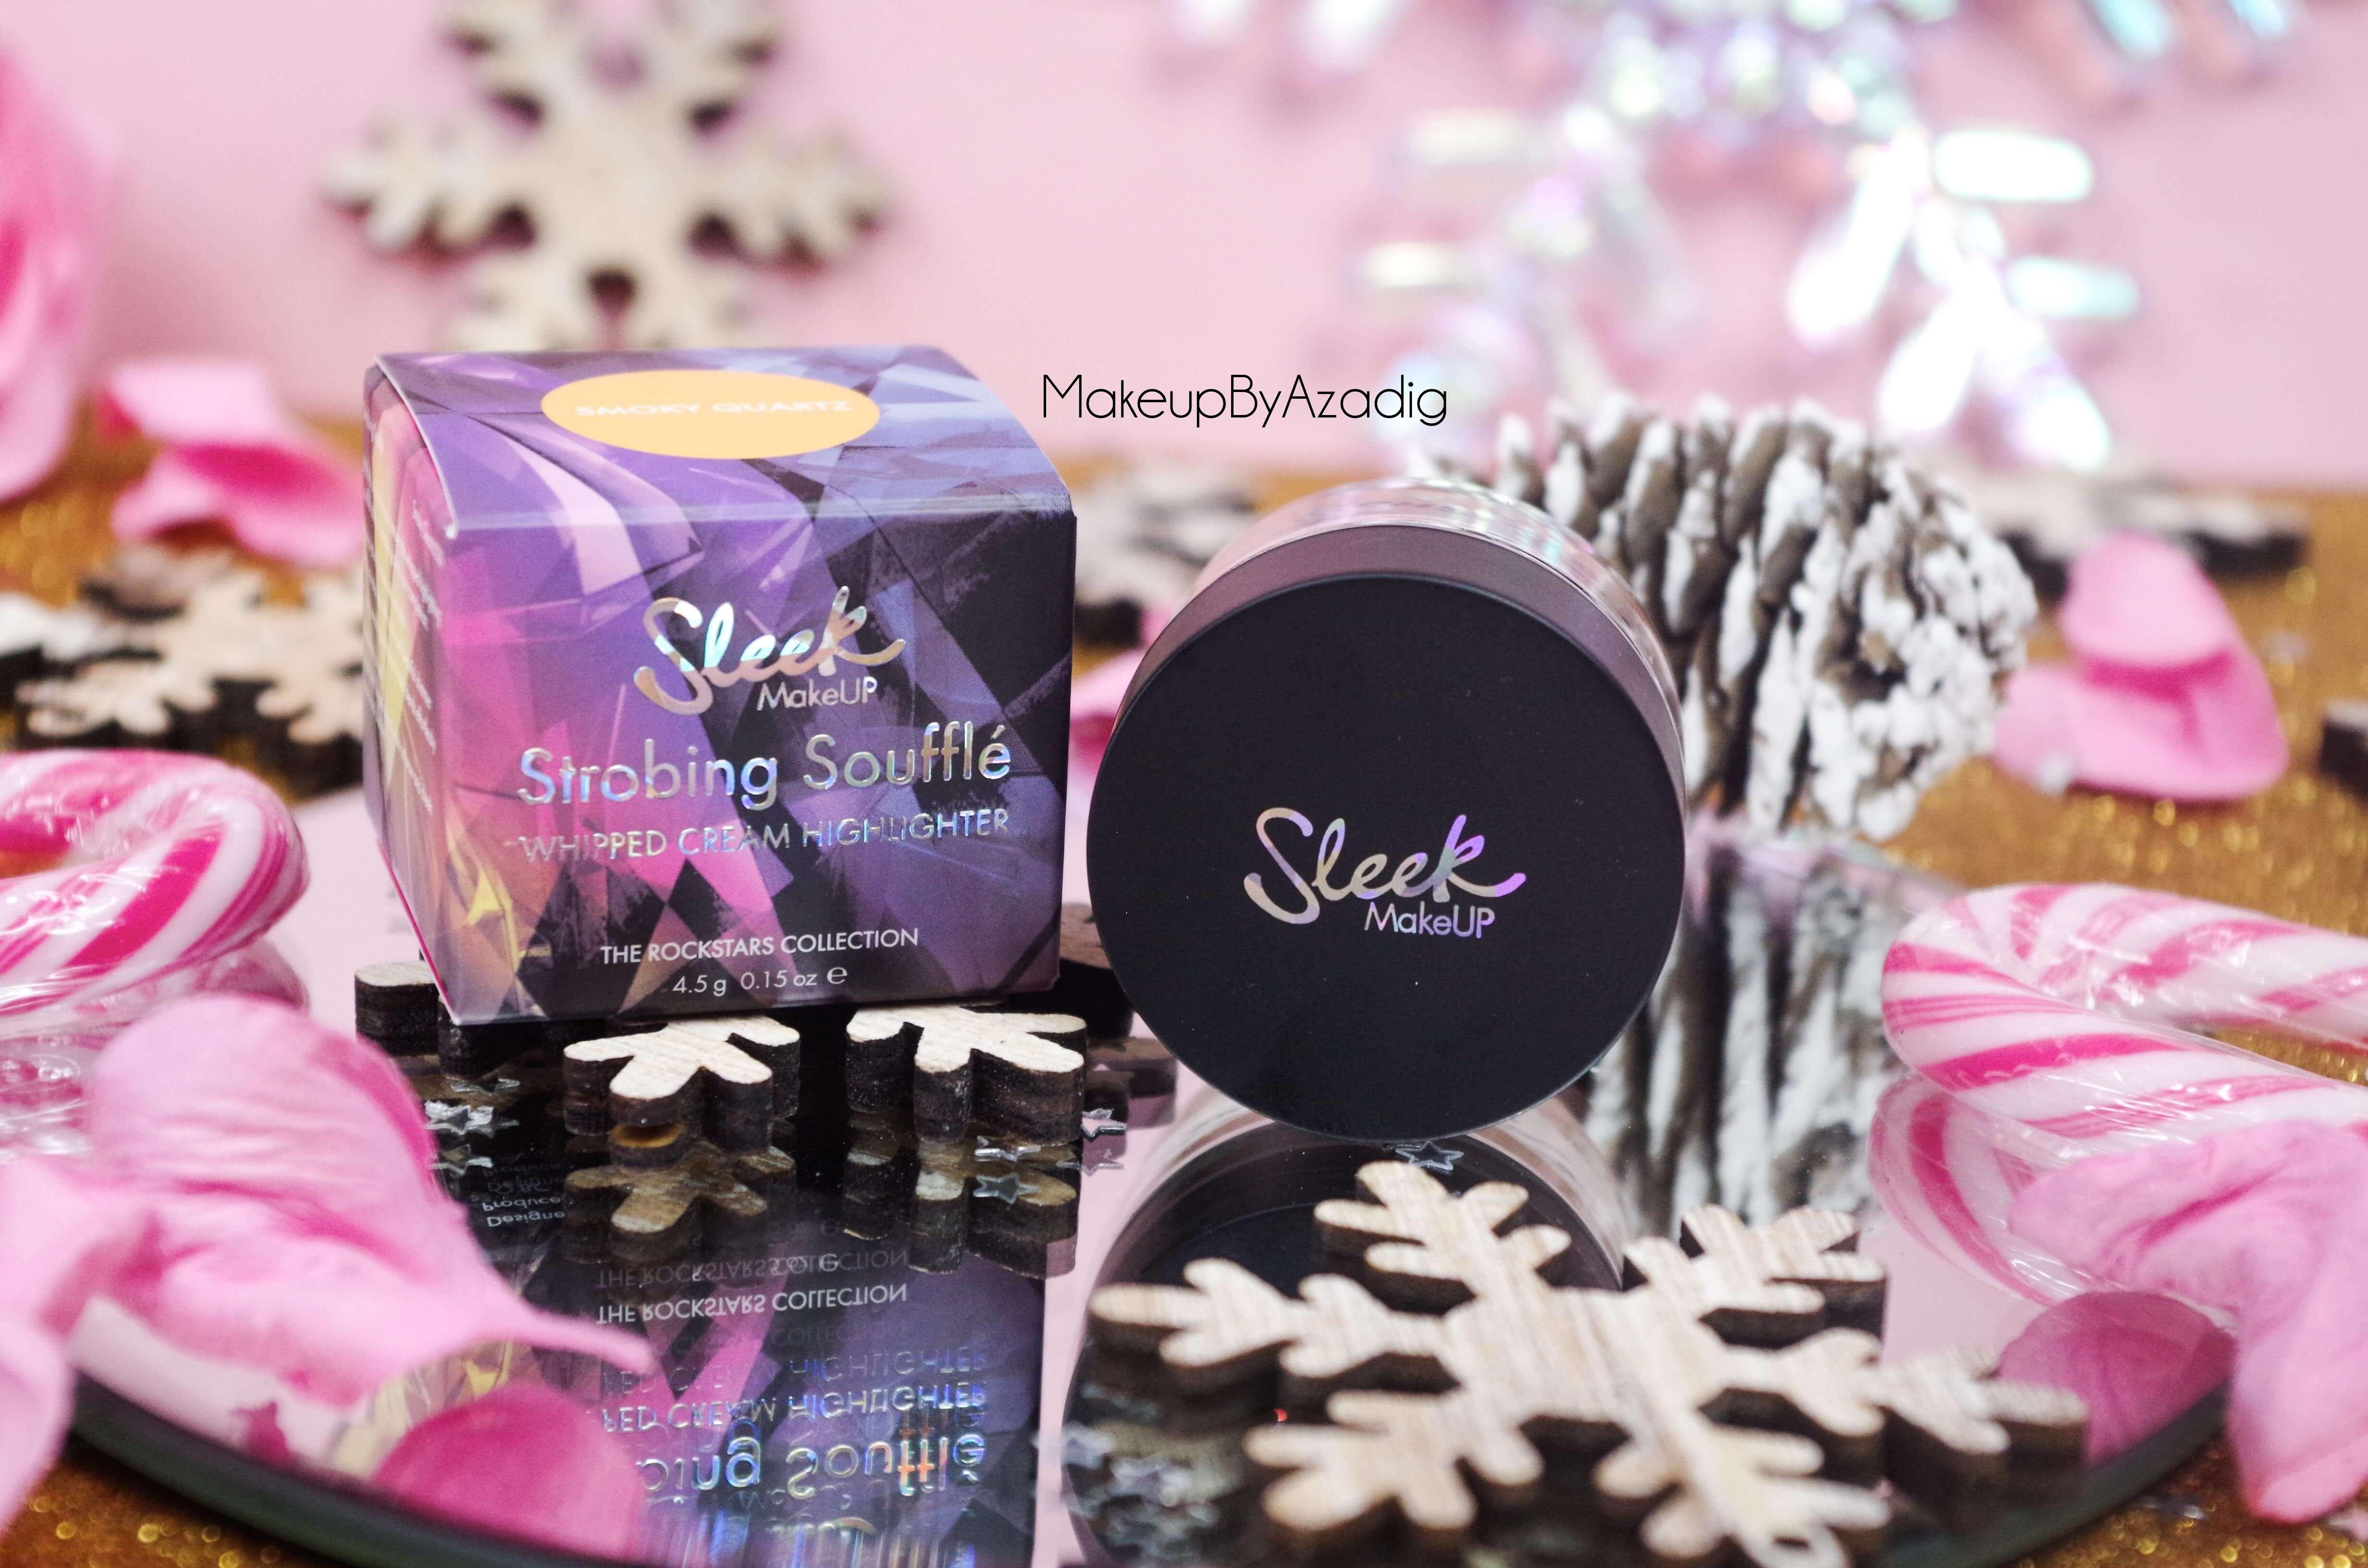 highlighter-sleek-makeup-strobing-souffle-smoky-quartz-sephora-swatch-makeupbyazadig-avis-miniature